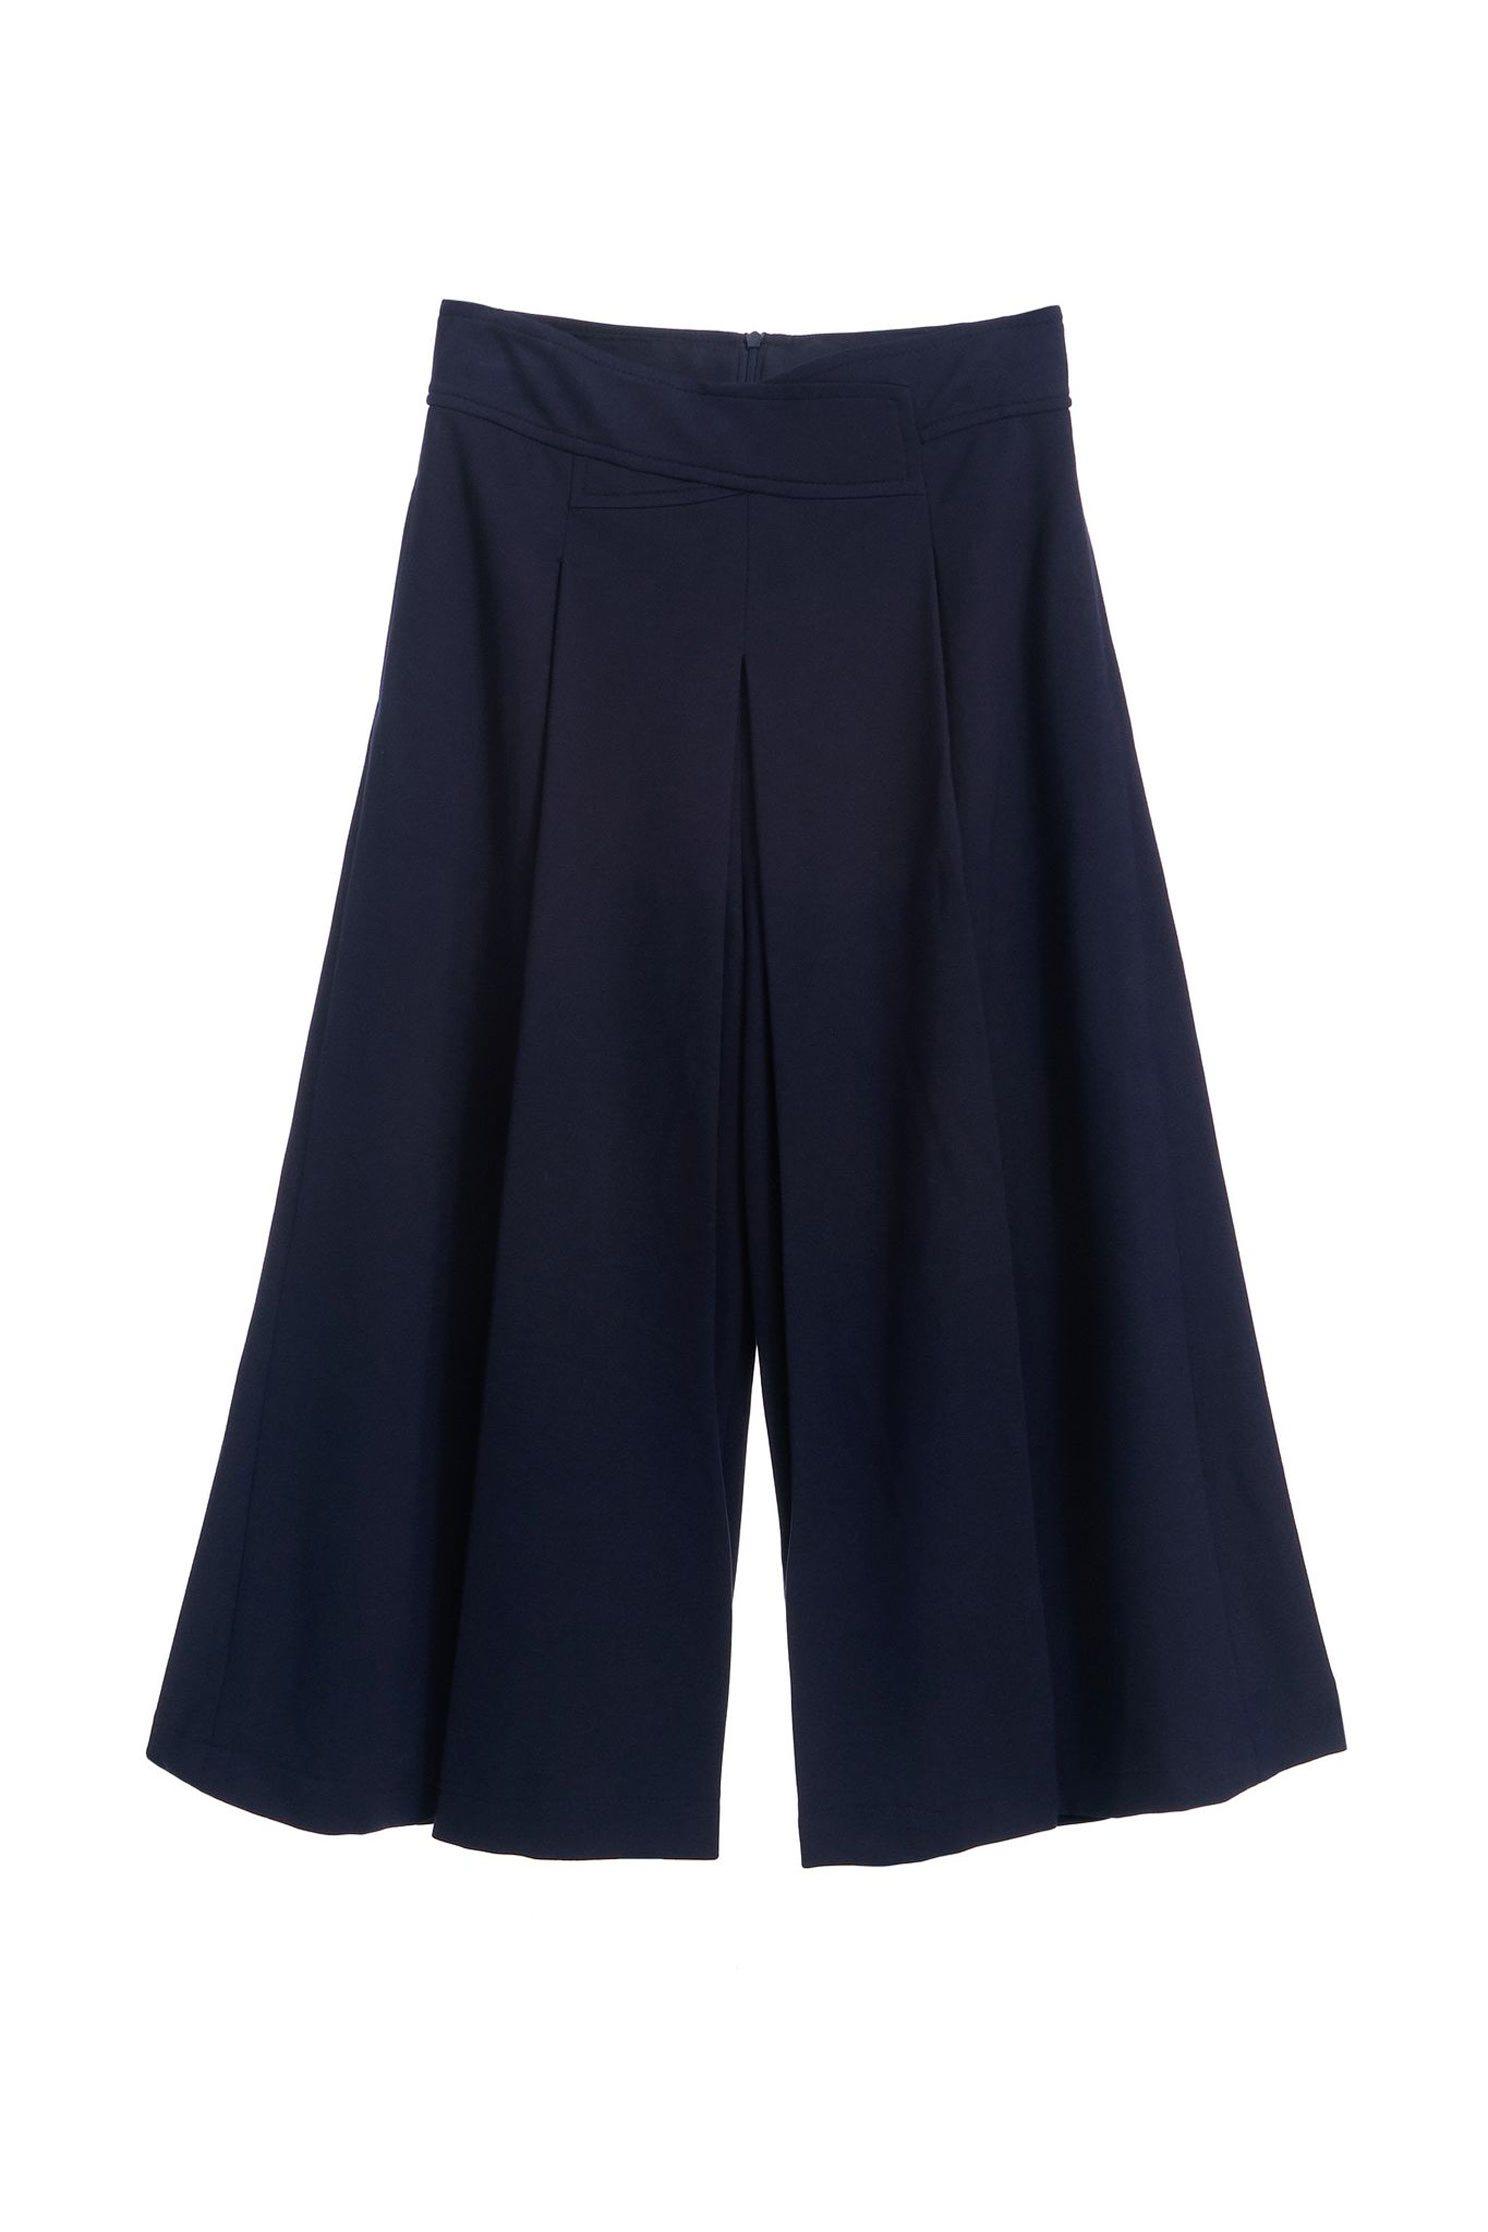 Roman wide trousers,culottespants,pants,knitting,pants